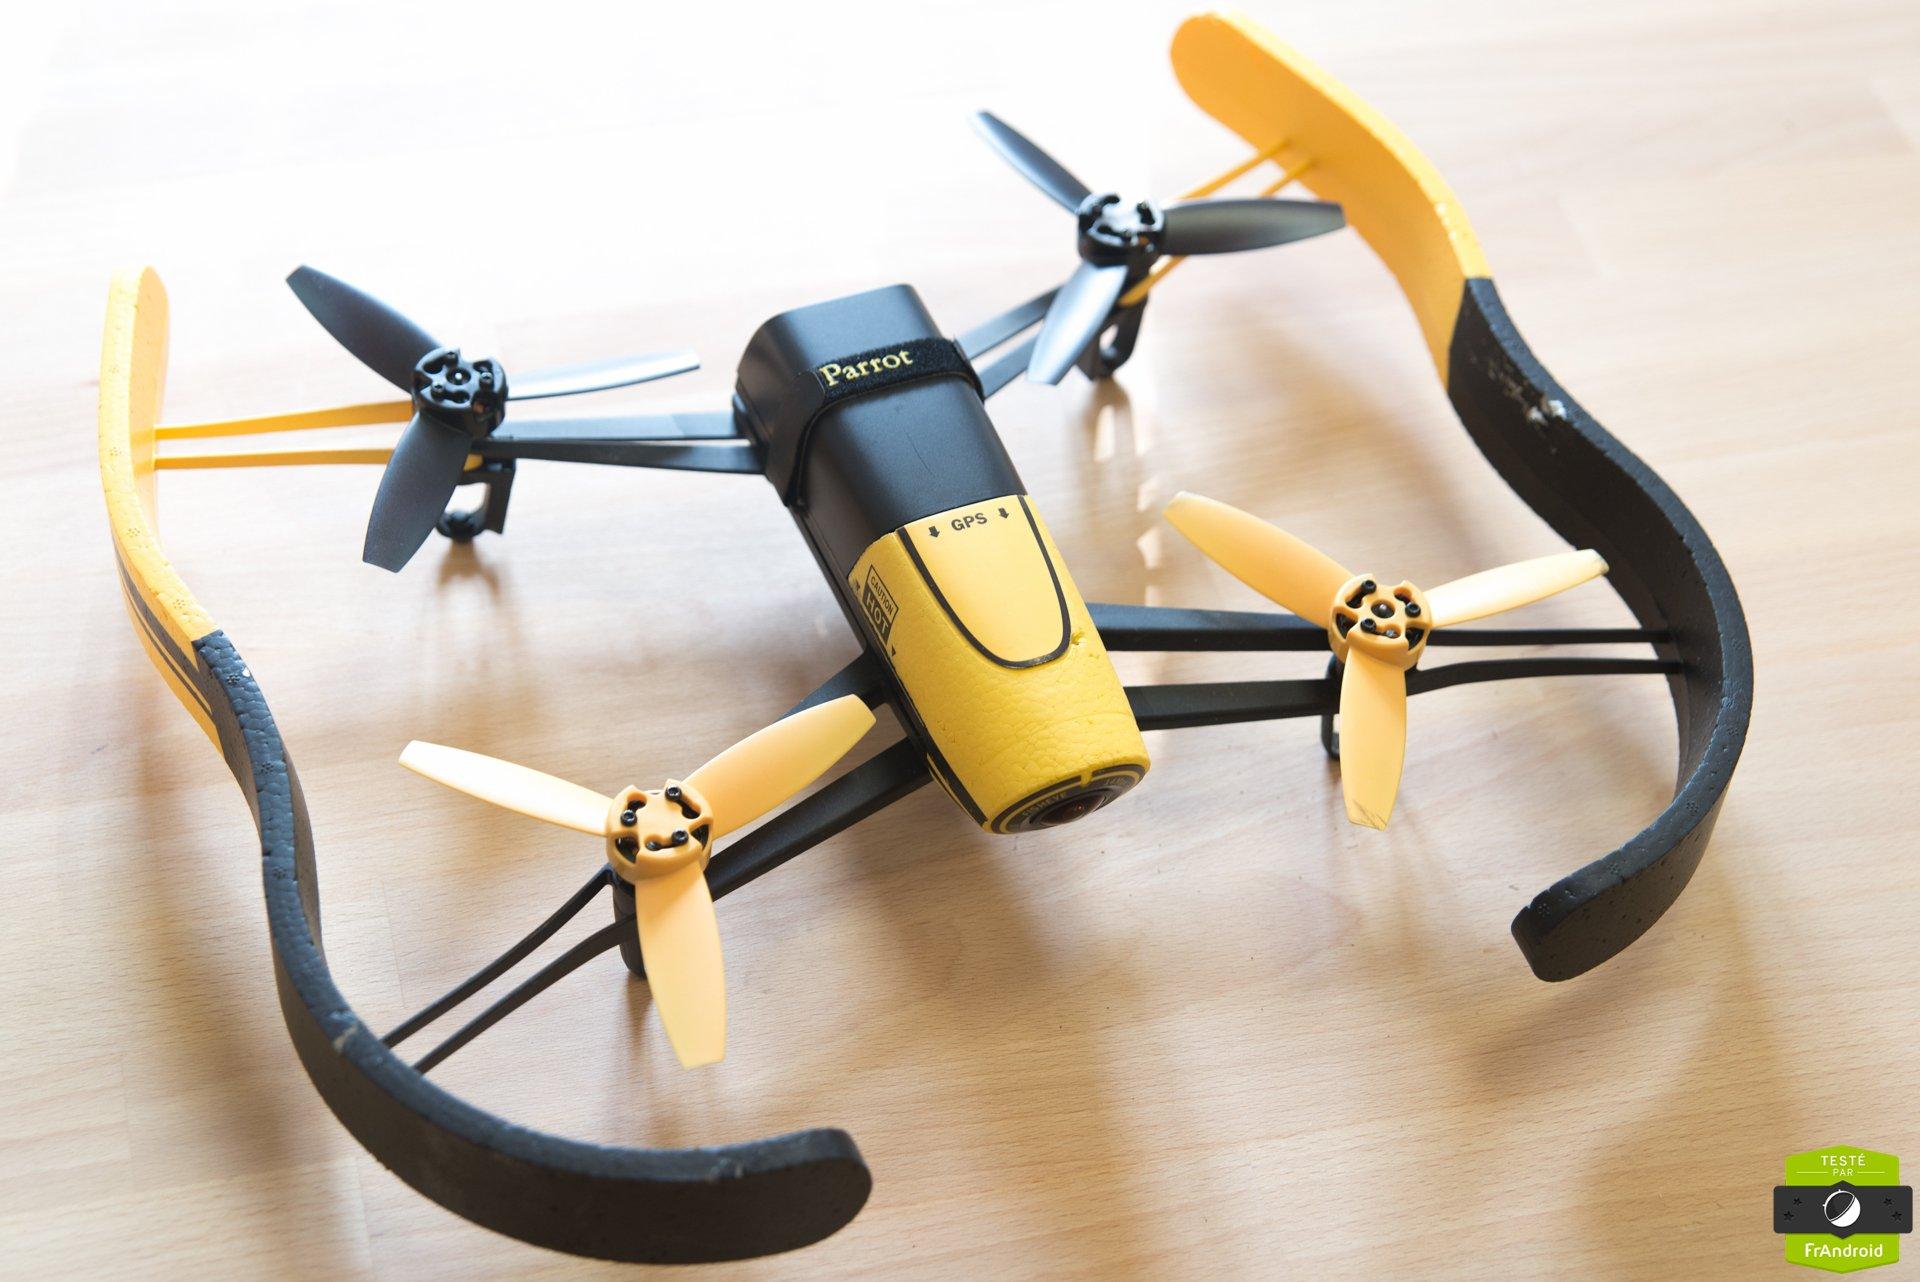 test du parrot bebop drone les vid os de vacances prennent leur envol frandroid. Black Bedroom Furniture Sets. Home Design Ideas